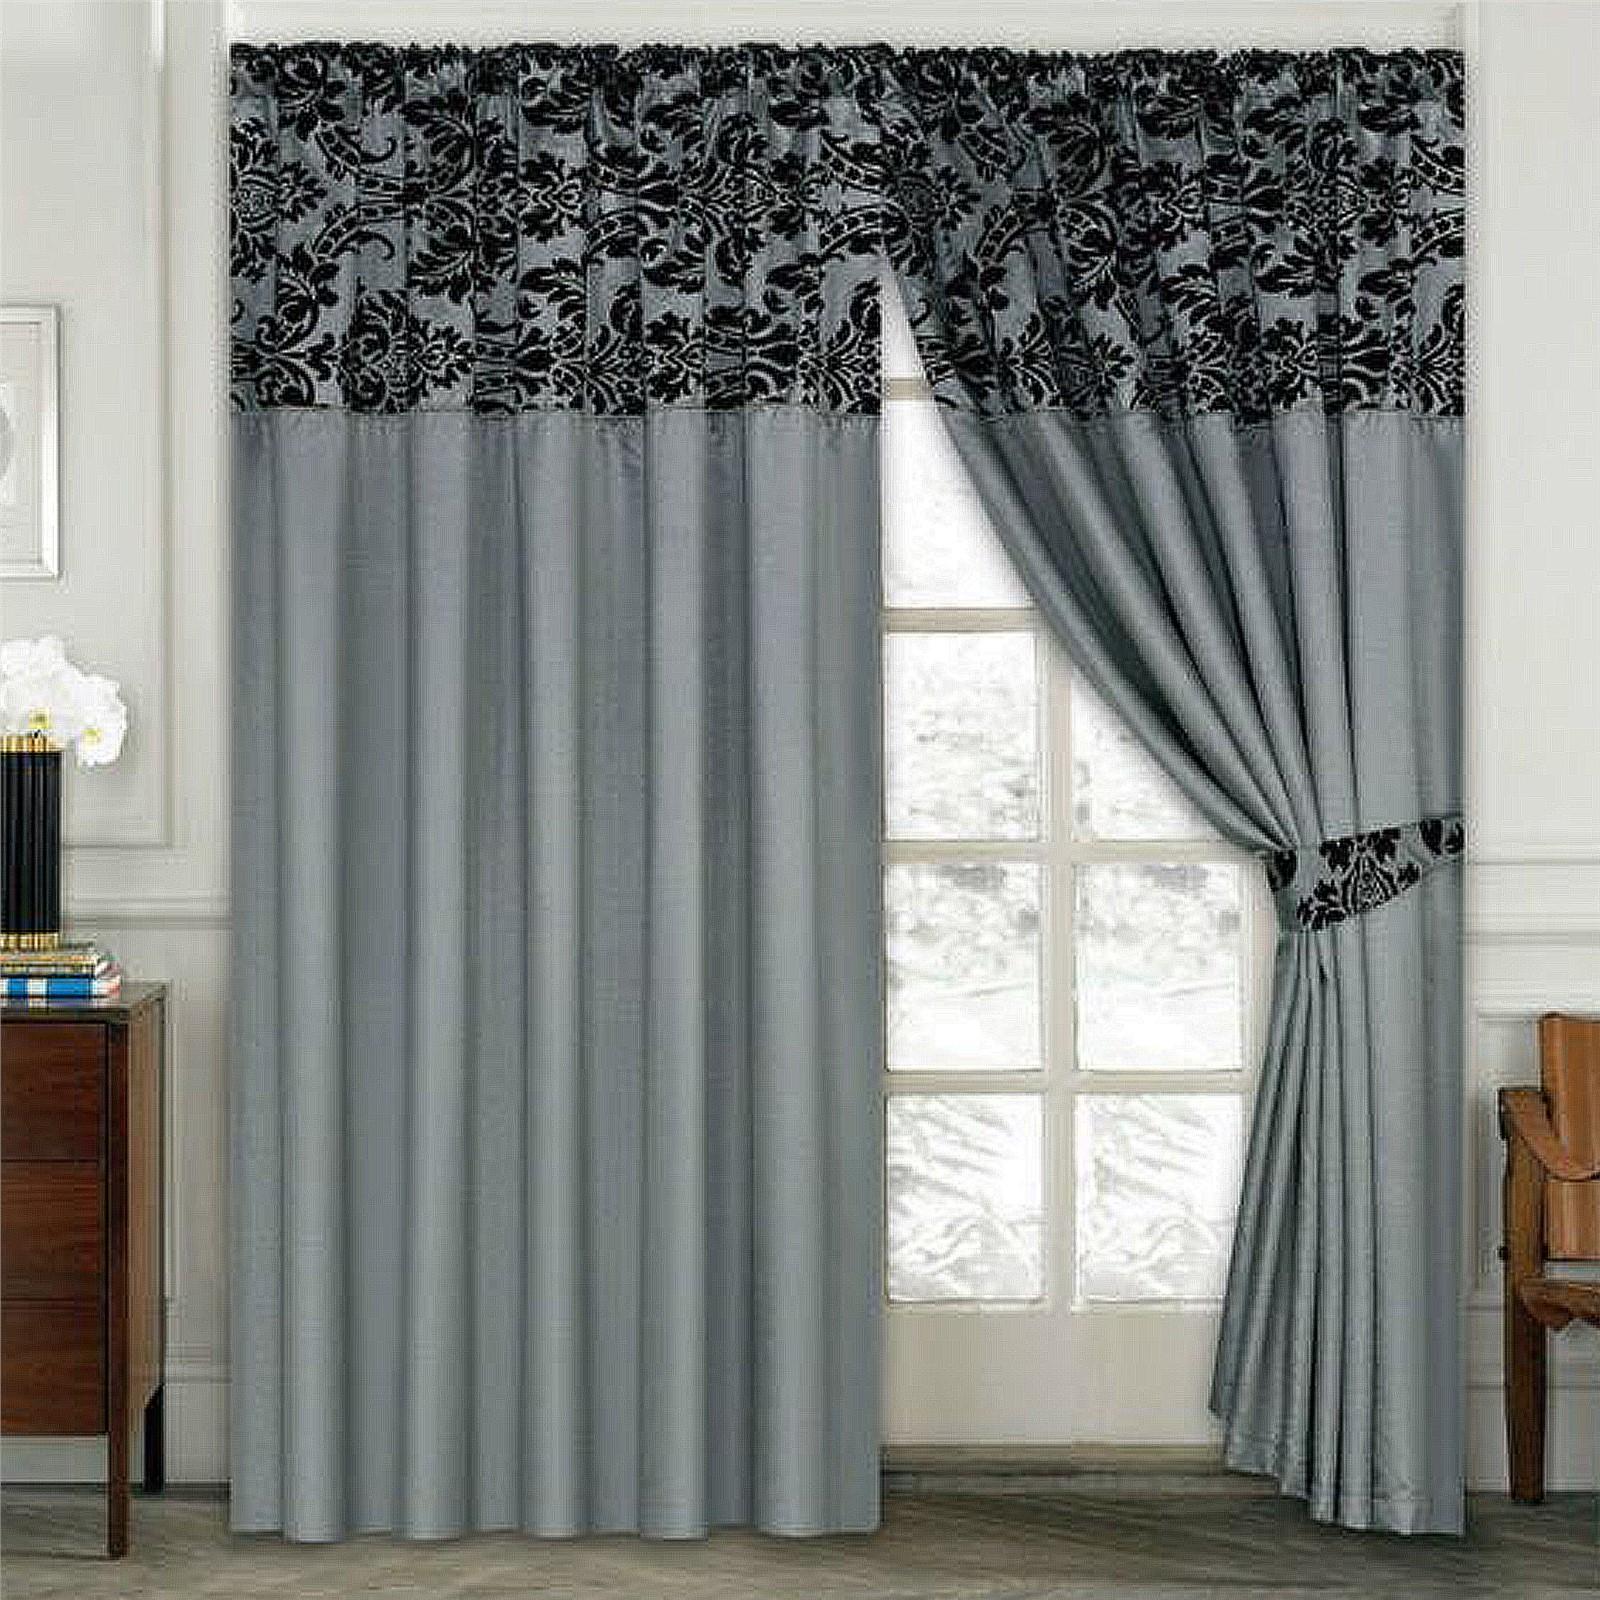 Industrial Pipe Curtain Rods Plastic Curtains Door Pvc Strip